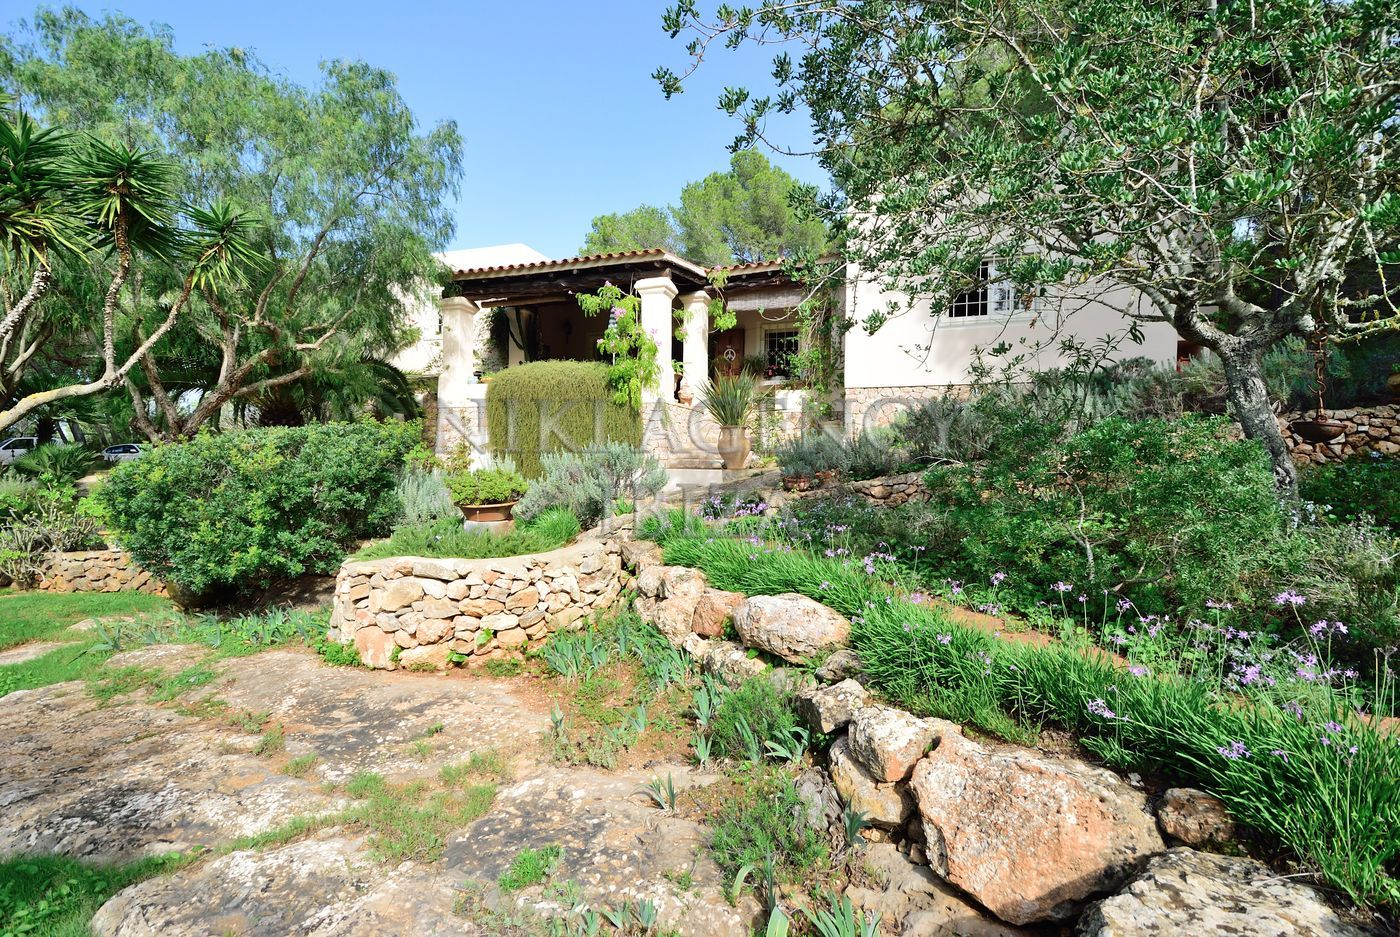 Villa in Benimussa, Ibiza, with 4 dormitorios-CVE50901